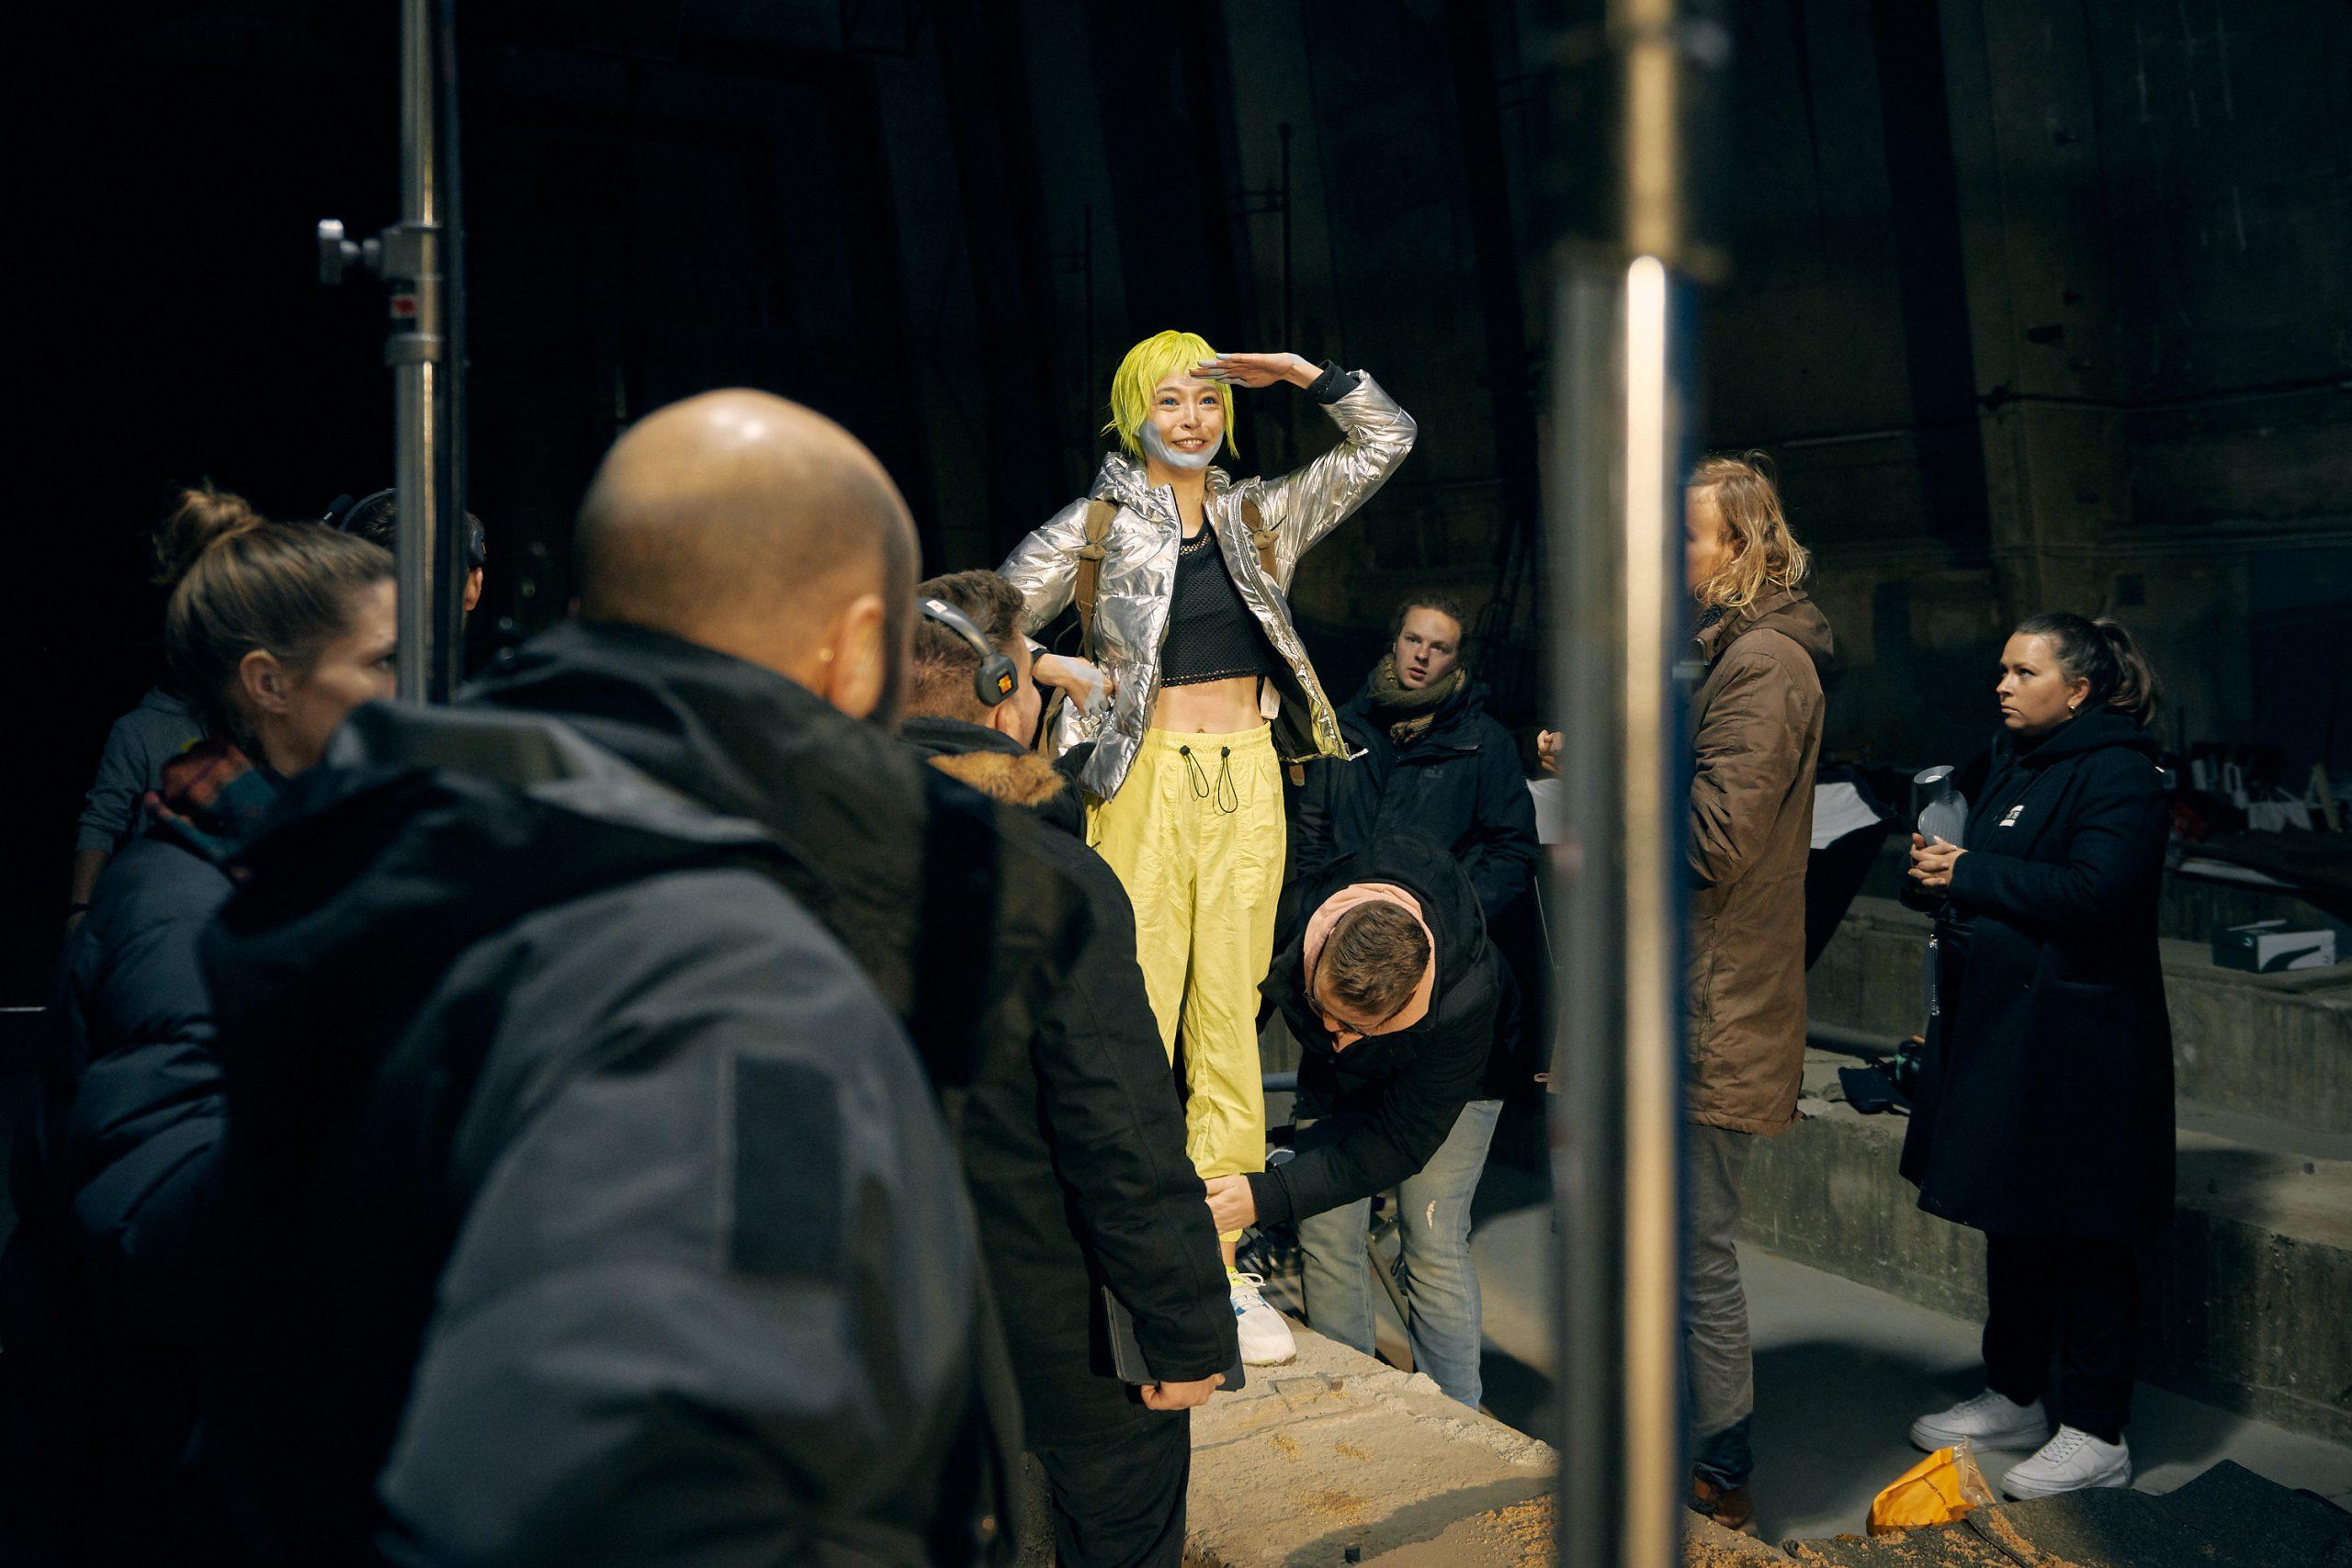 Behind the Scenes OVERKILL x PUMA Filmdreh